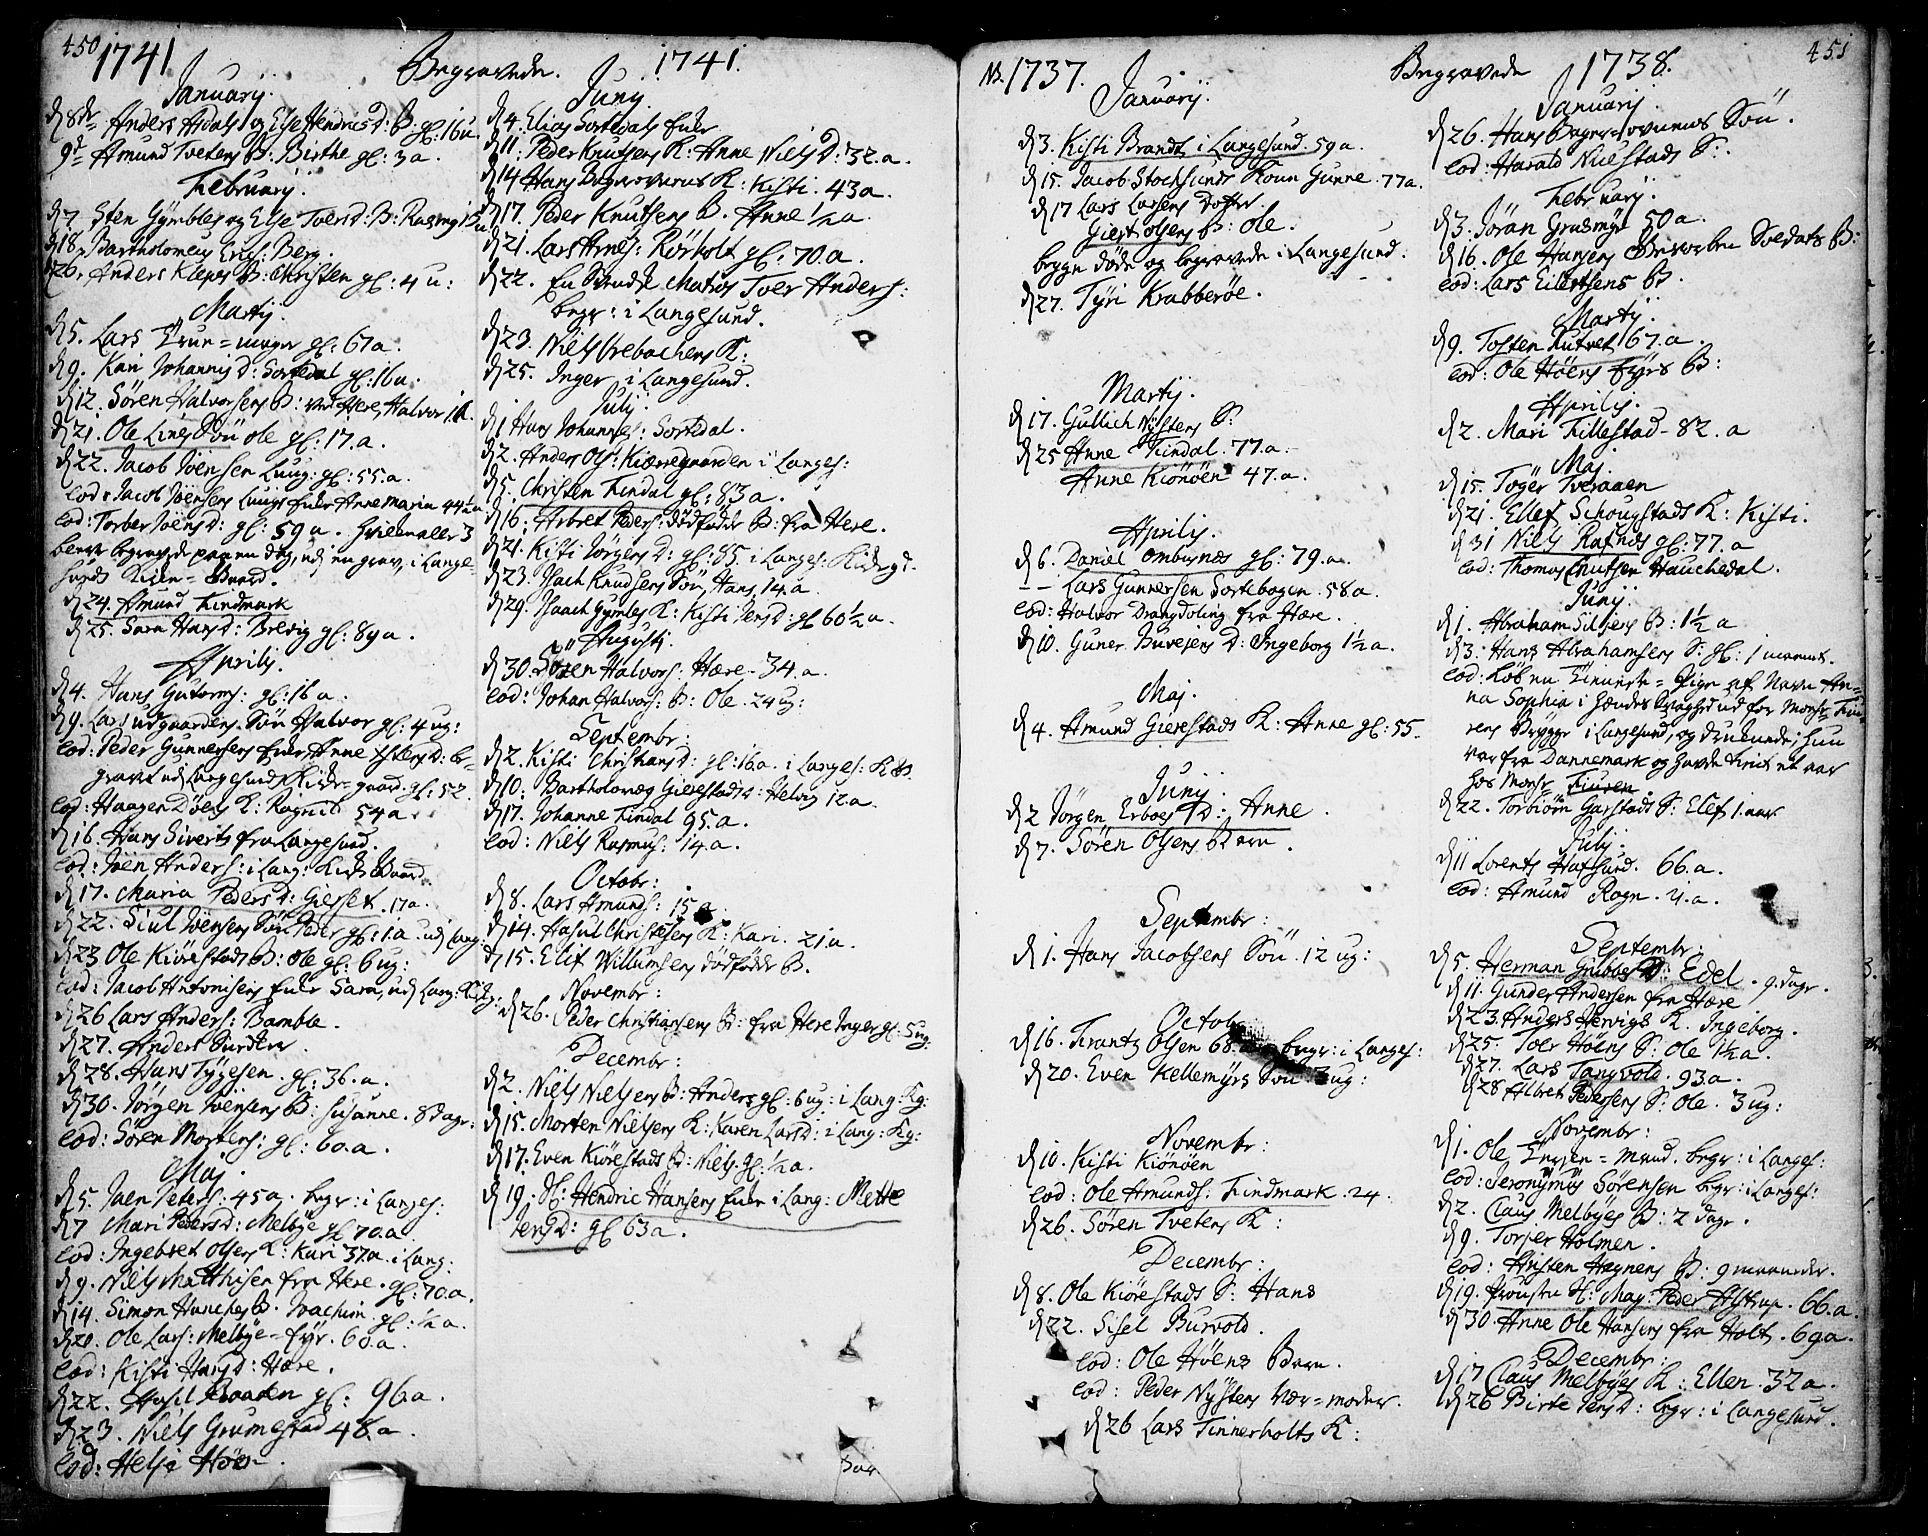 SAKO, Bamble kirkebøker, F/Fa/L0001: Ministerialbok nr. I 1, 1702-1774, s. 450-451